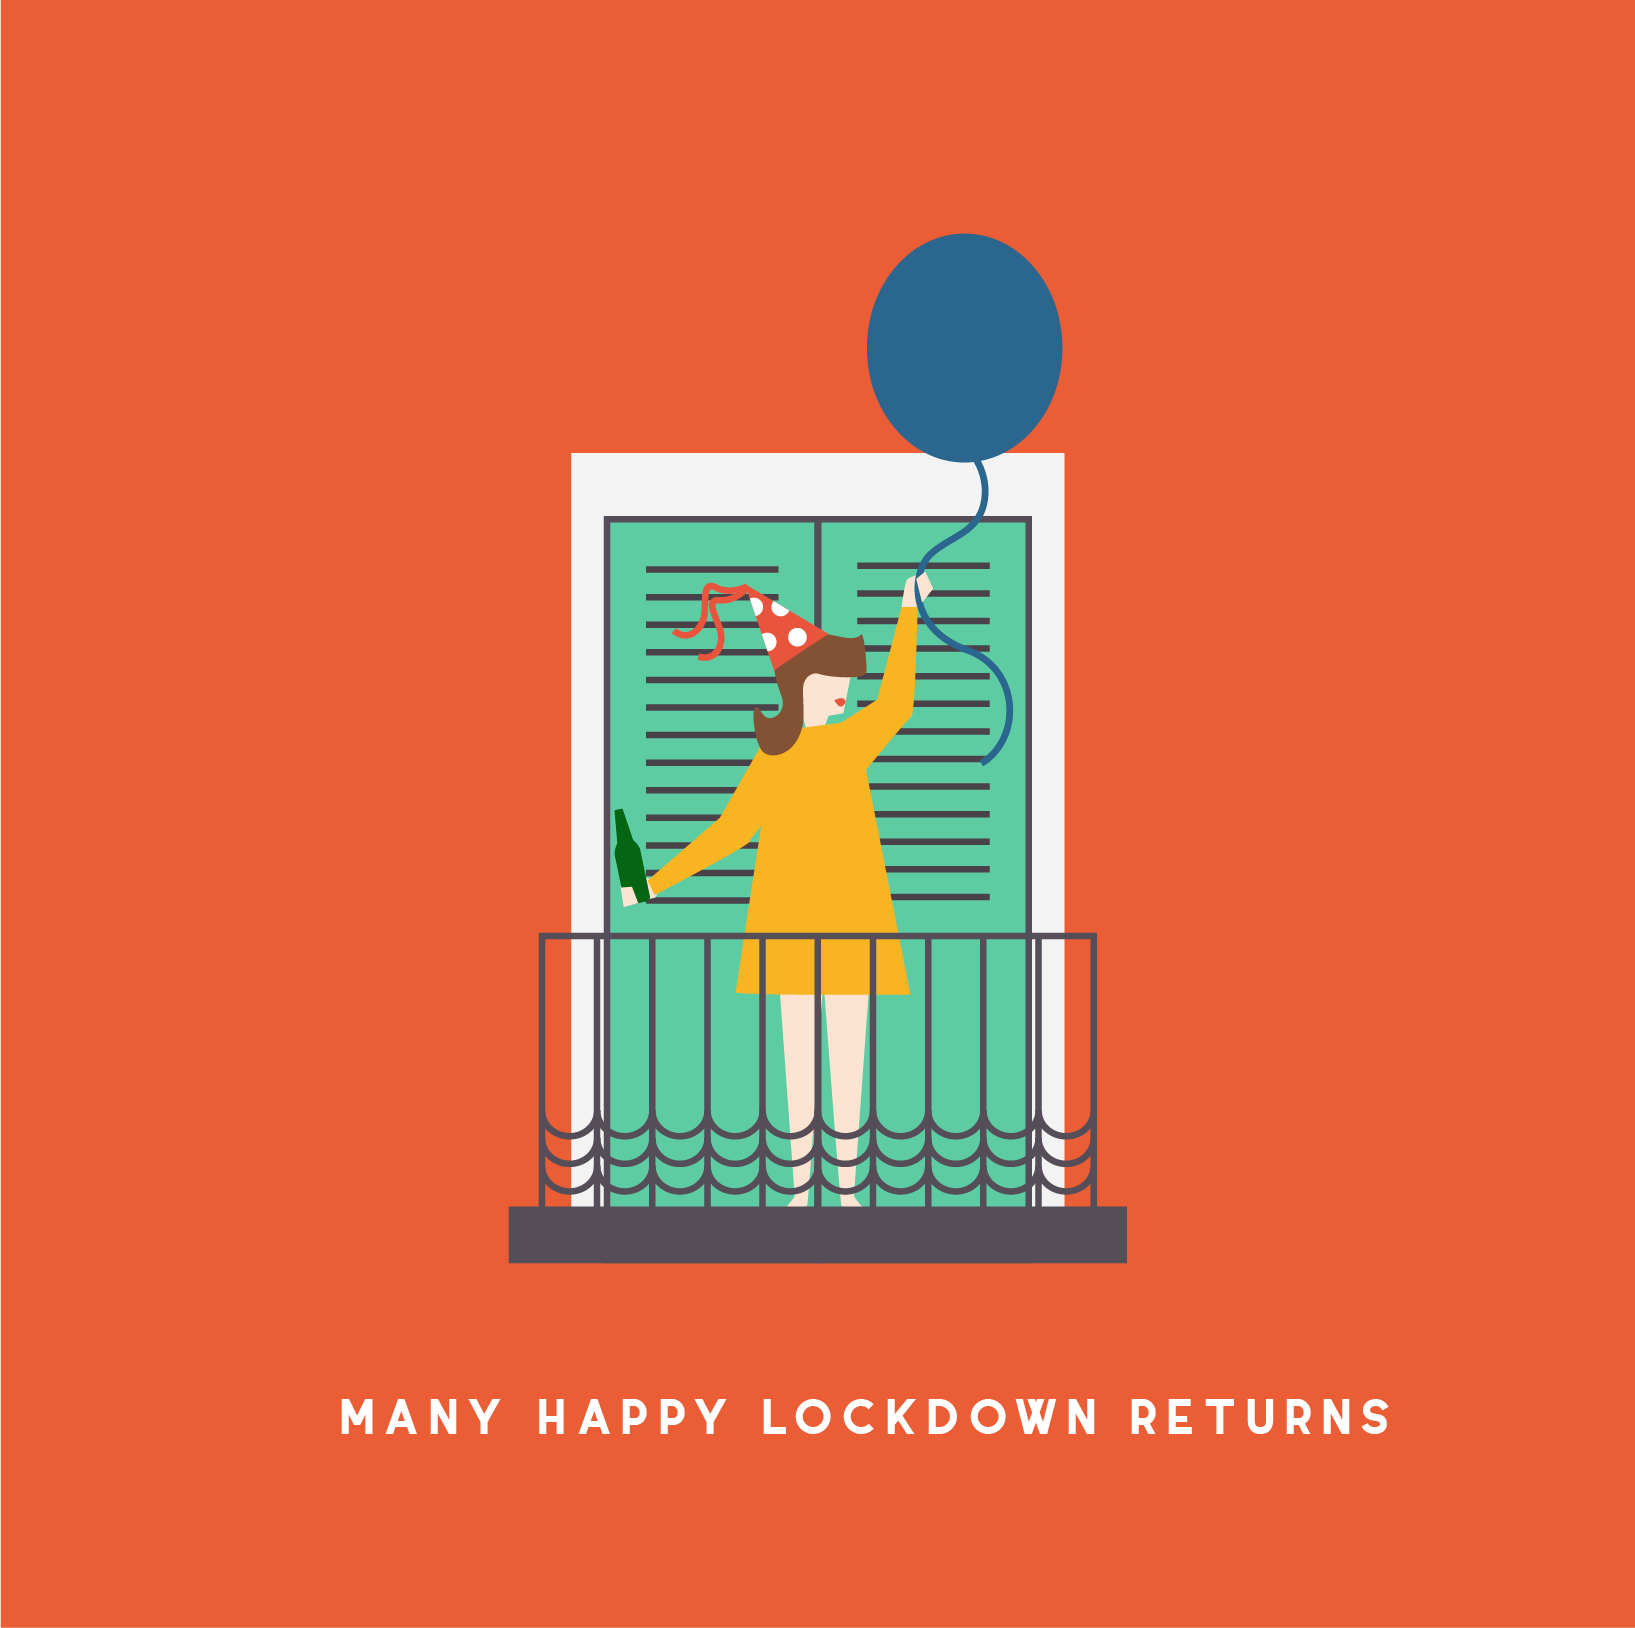 LOCKDOWN BIRTHDAY